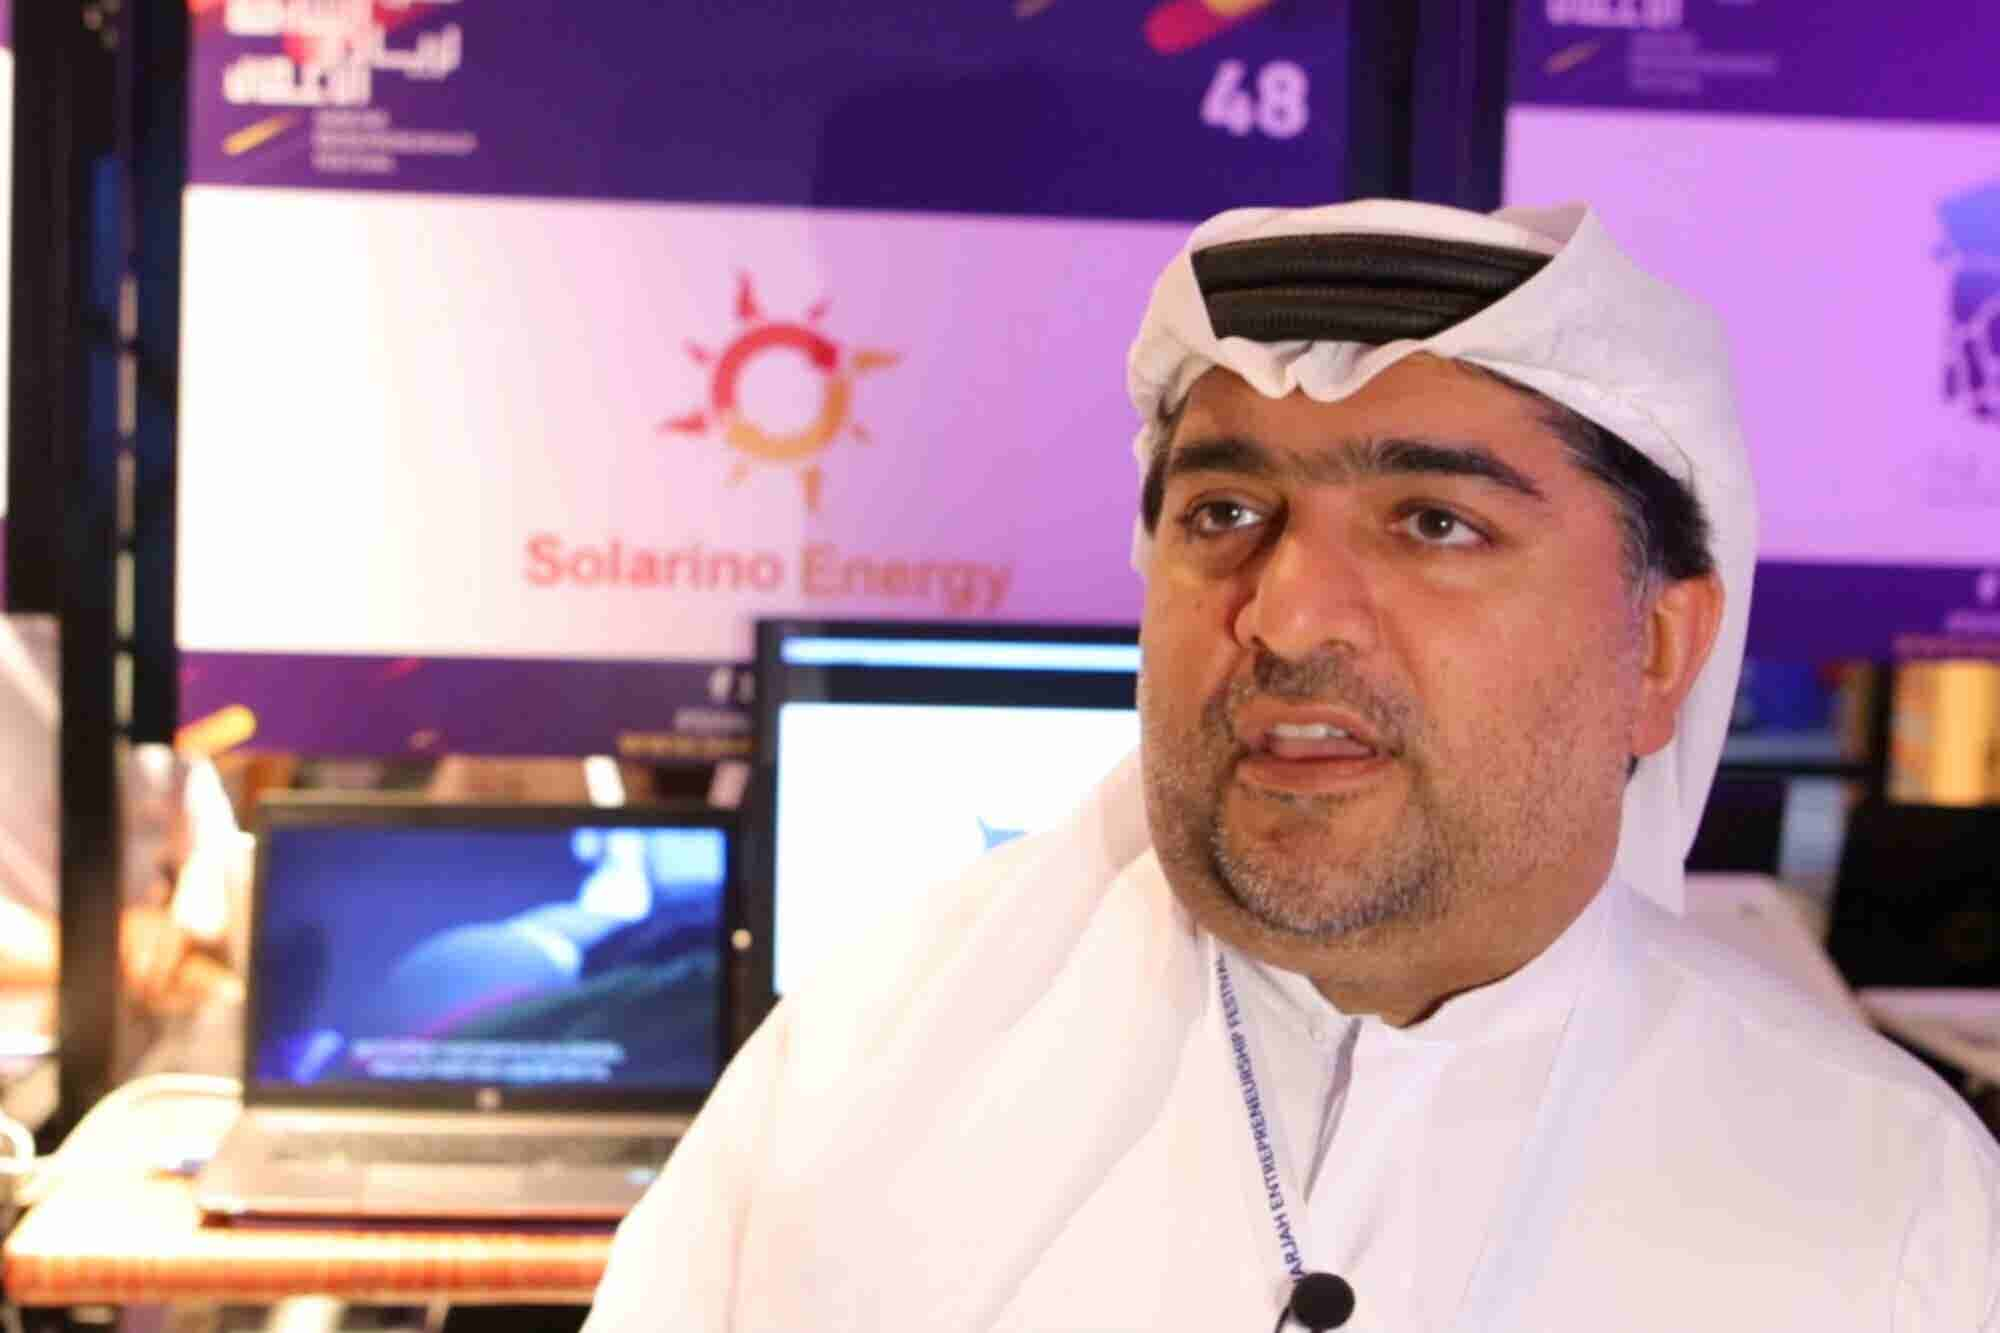 Solarino Energy Solutions' Yaqoub Abdalla Alali Commends Ecosystem Supporters